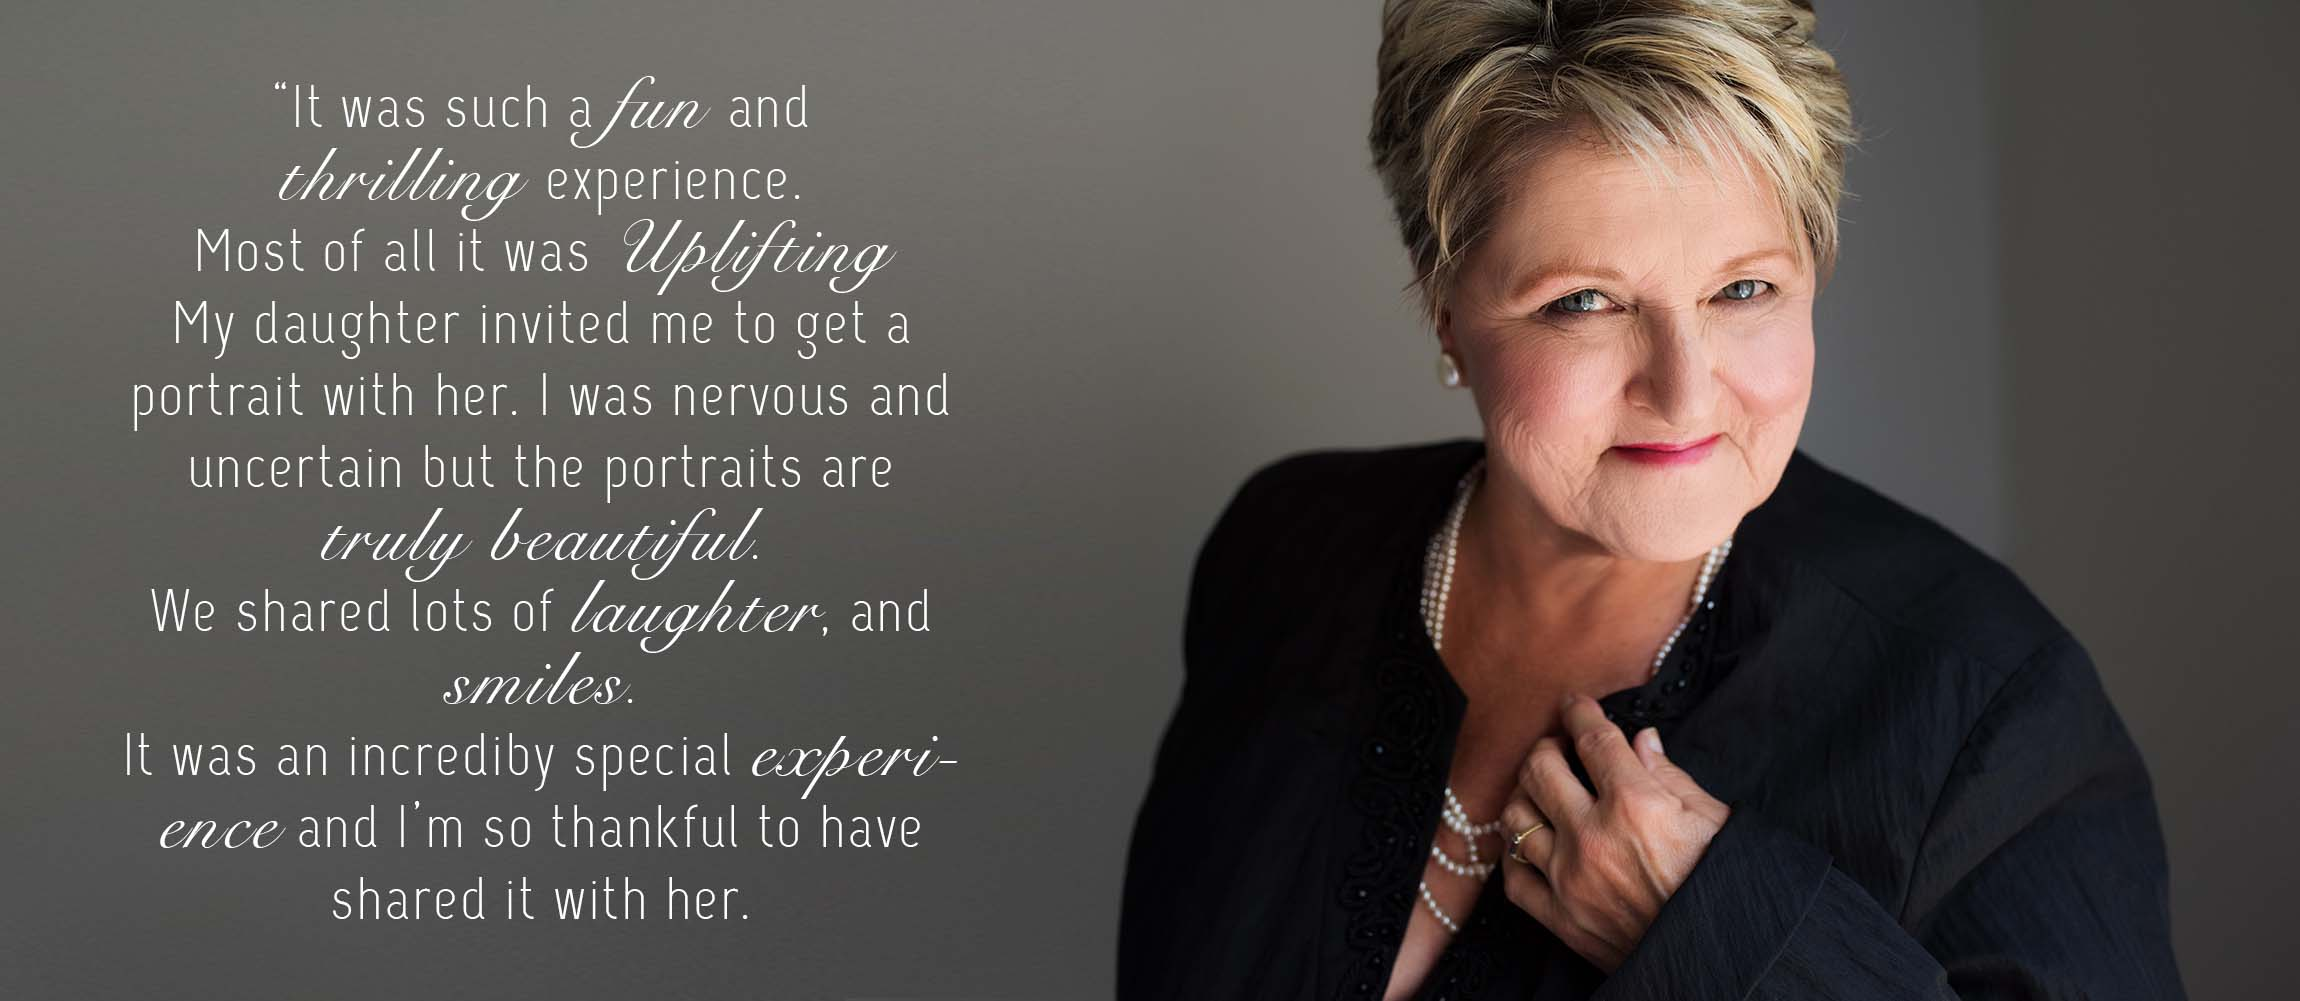 womens-portraiture-quote